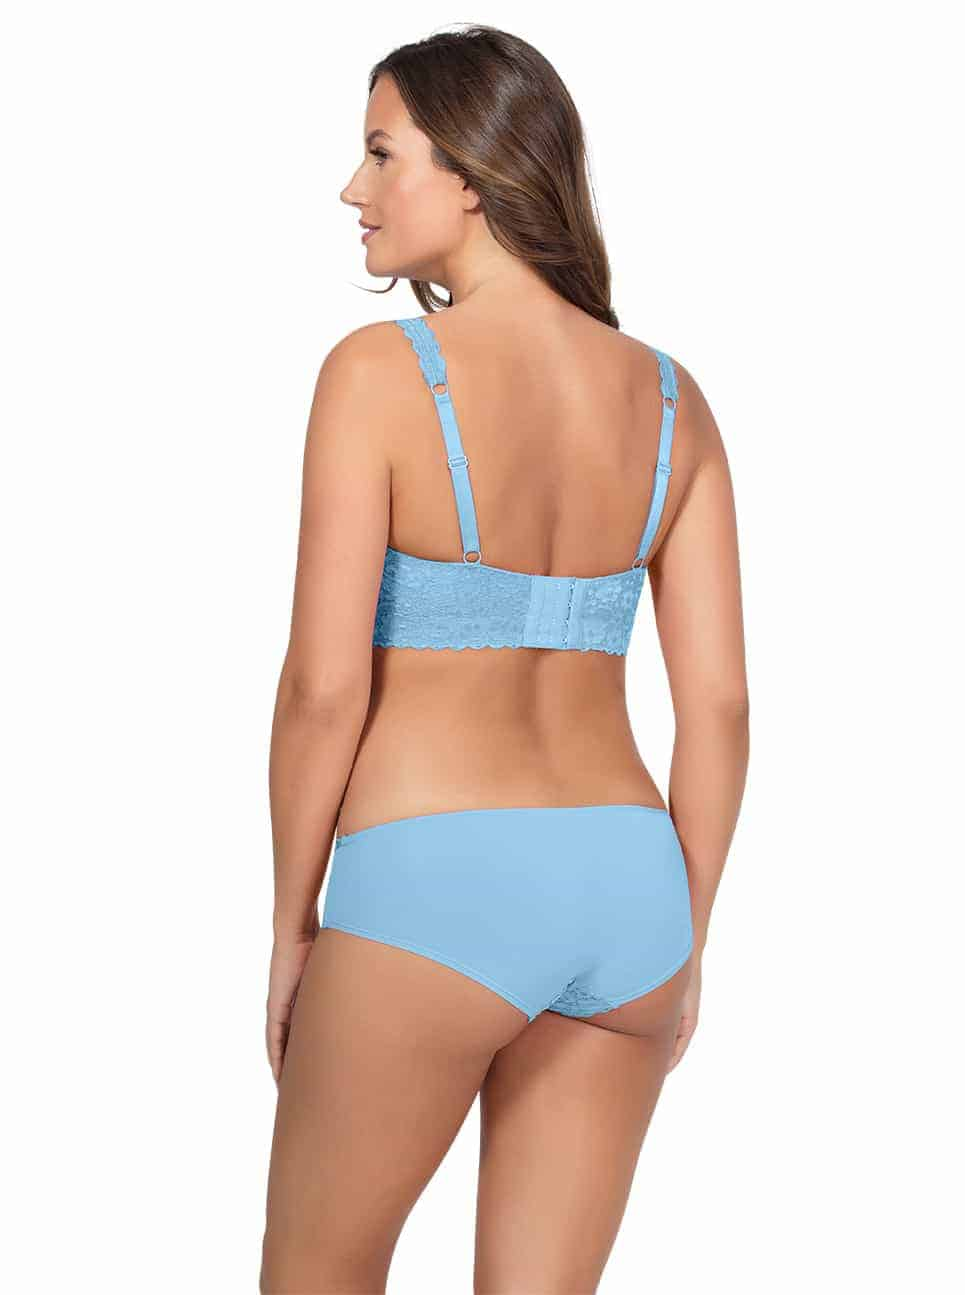 PARFAIT Adriana LaceBraletteP5482 BikiniP5483 SkyBlue Back - Adriana Lace Bralette - Sky Blue - P5482